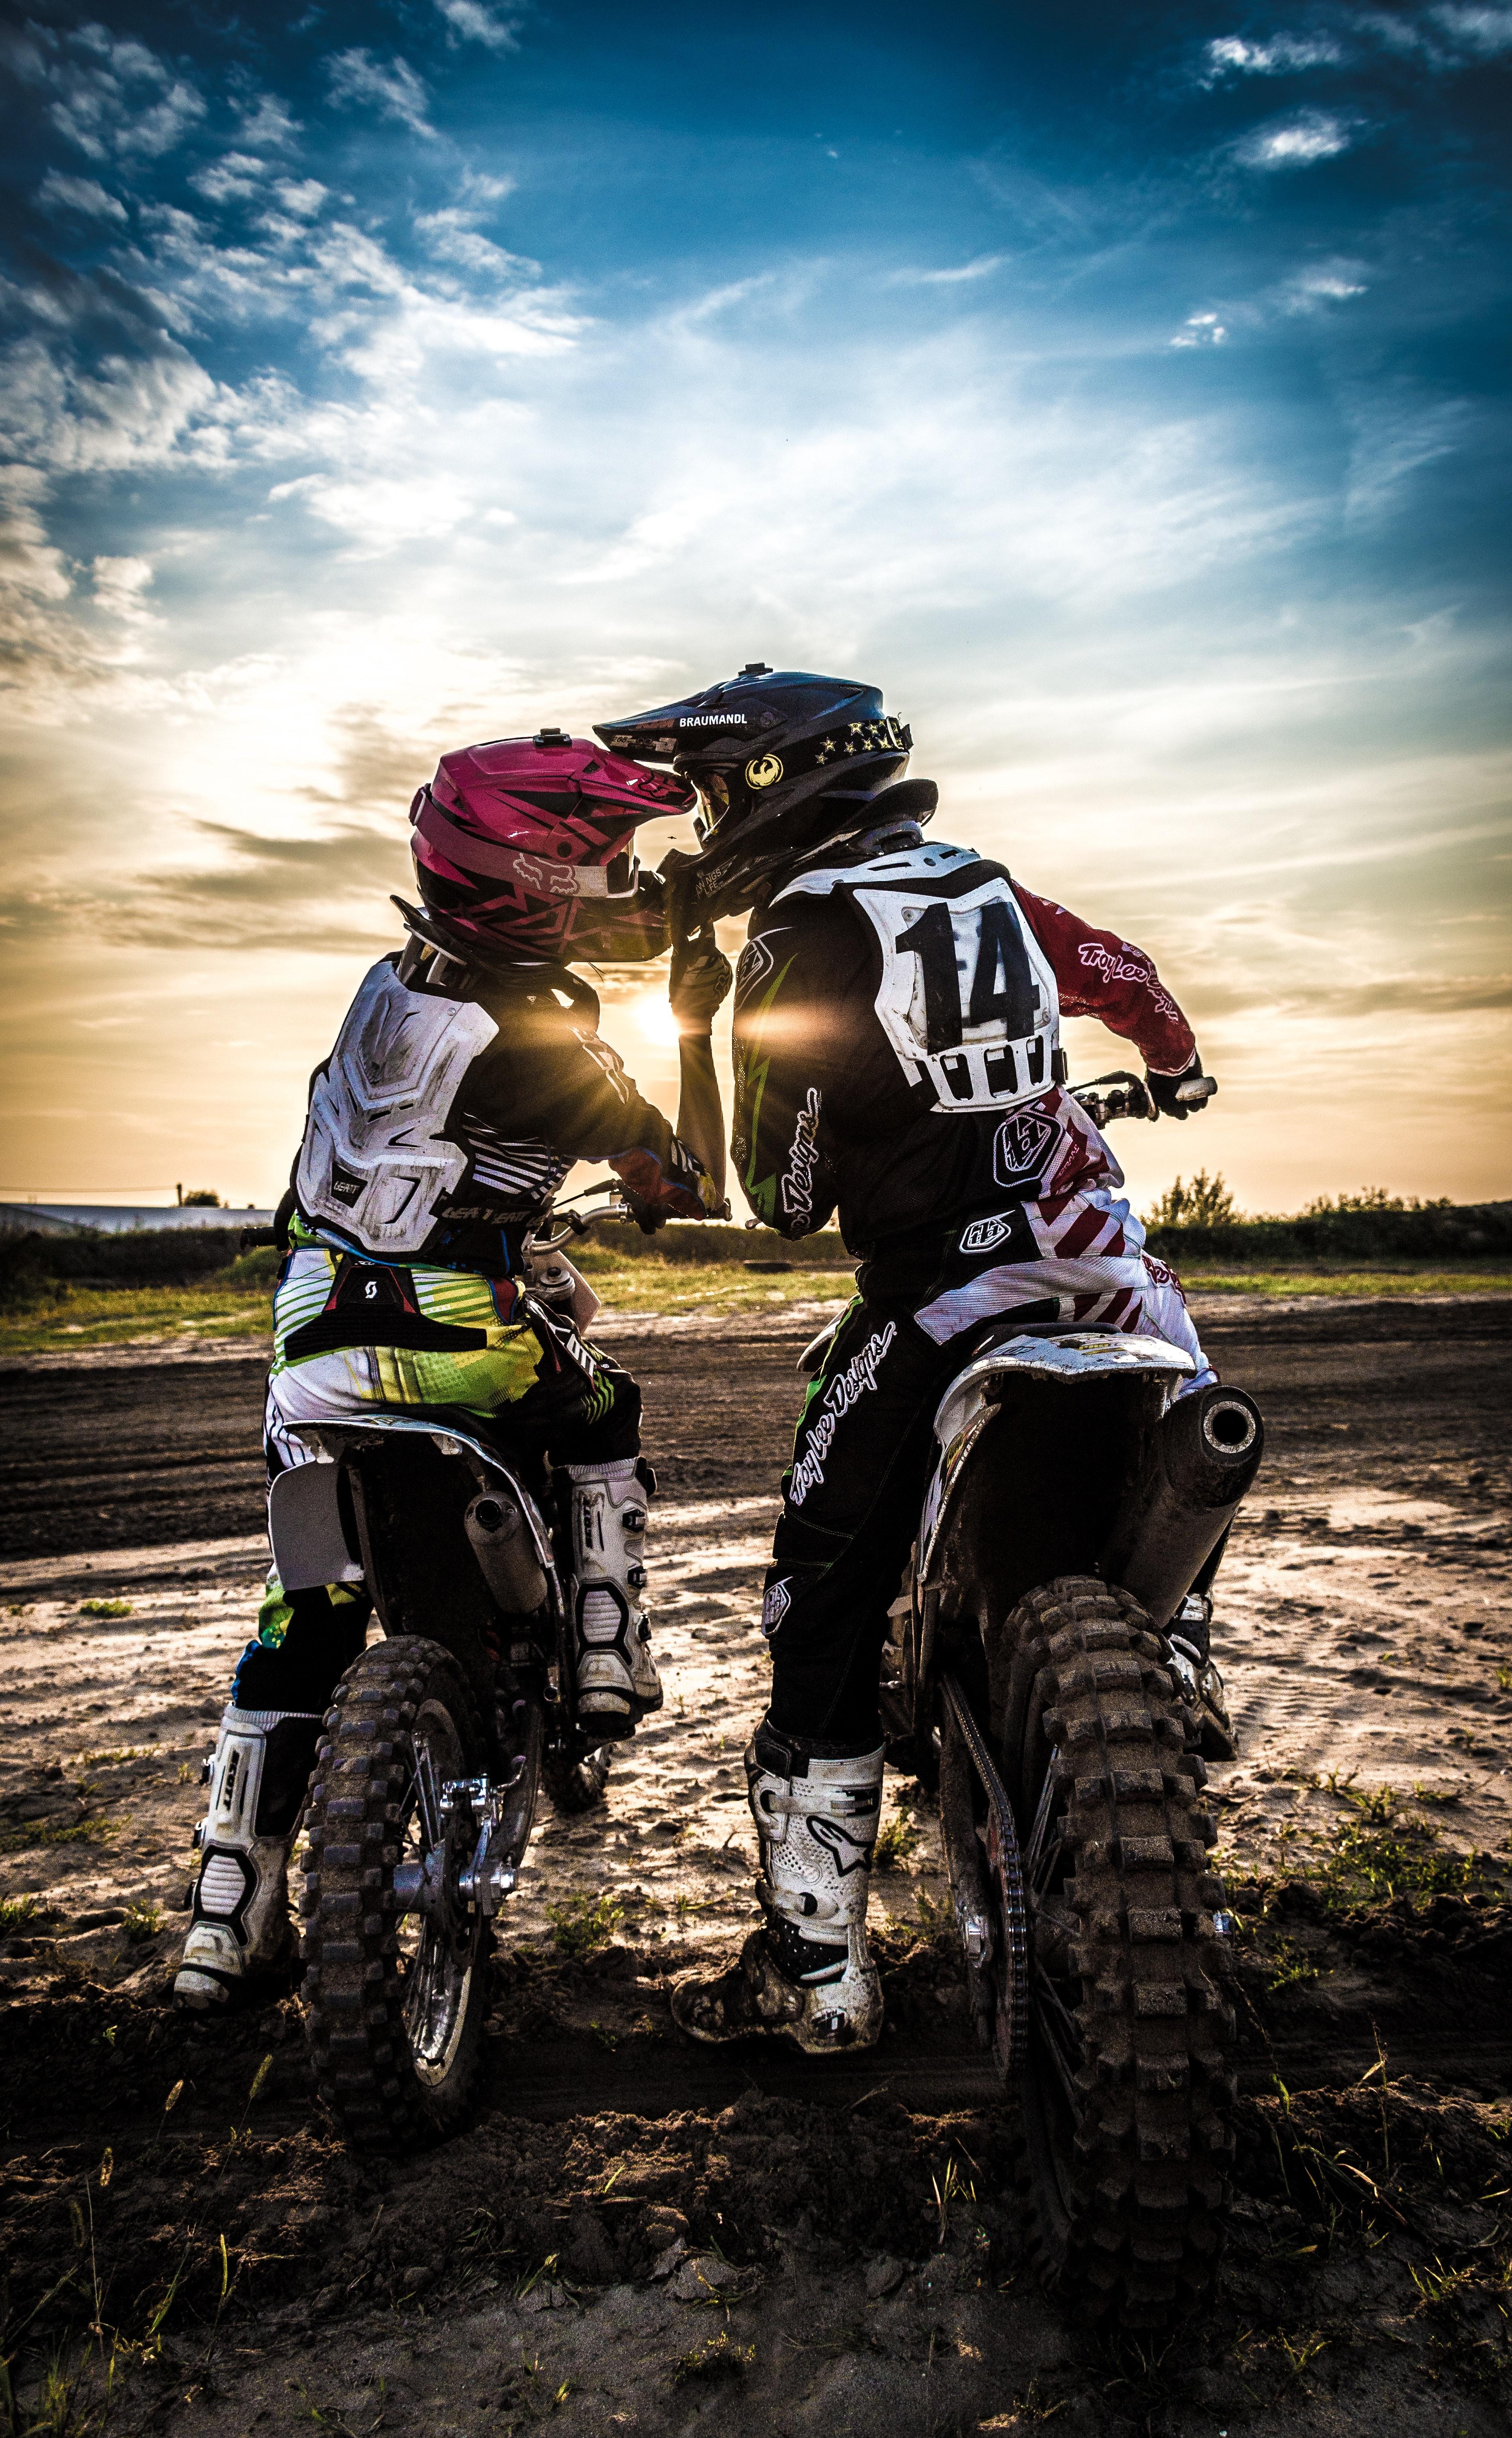 40+ great motocross photos · pexels · free stock photos